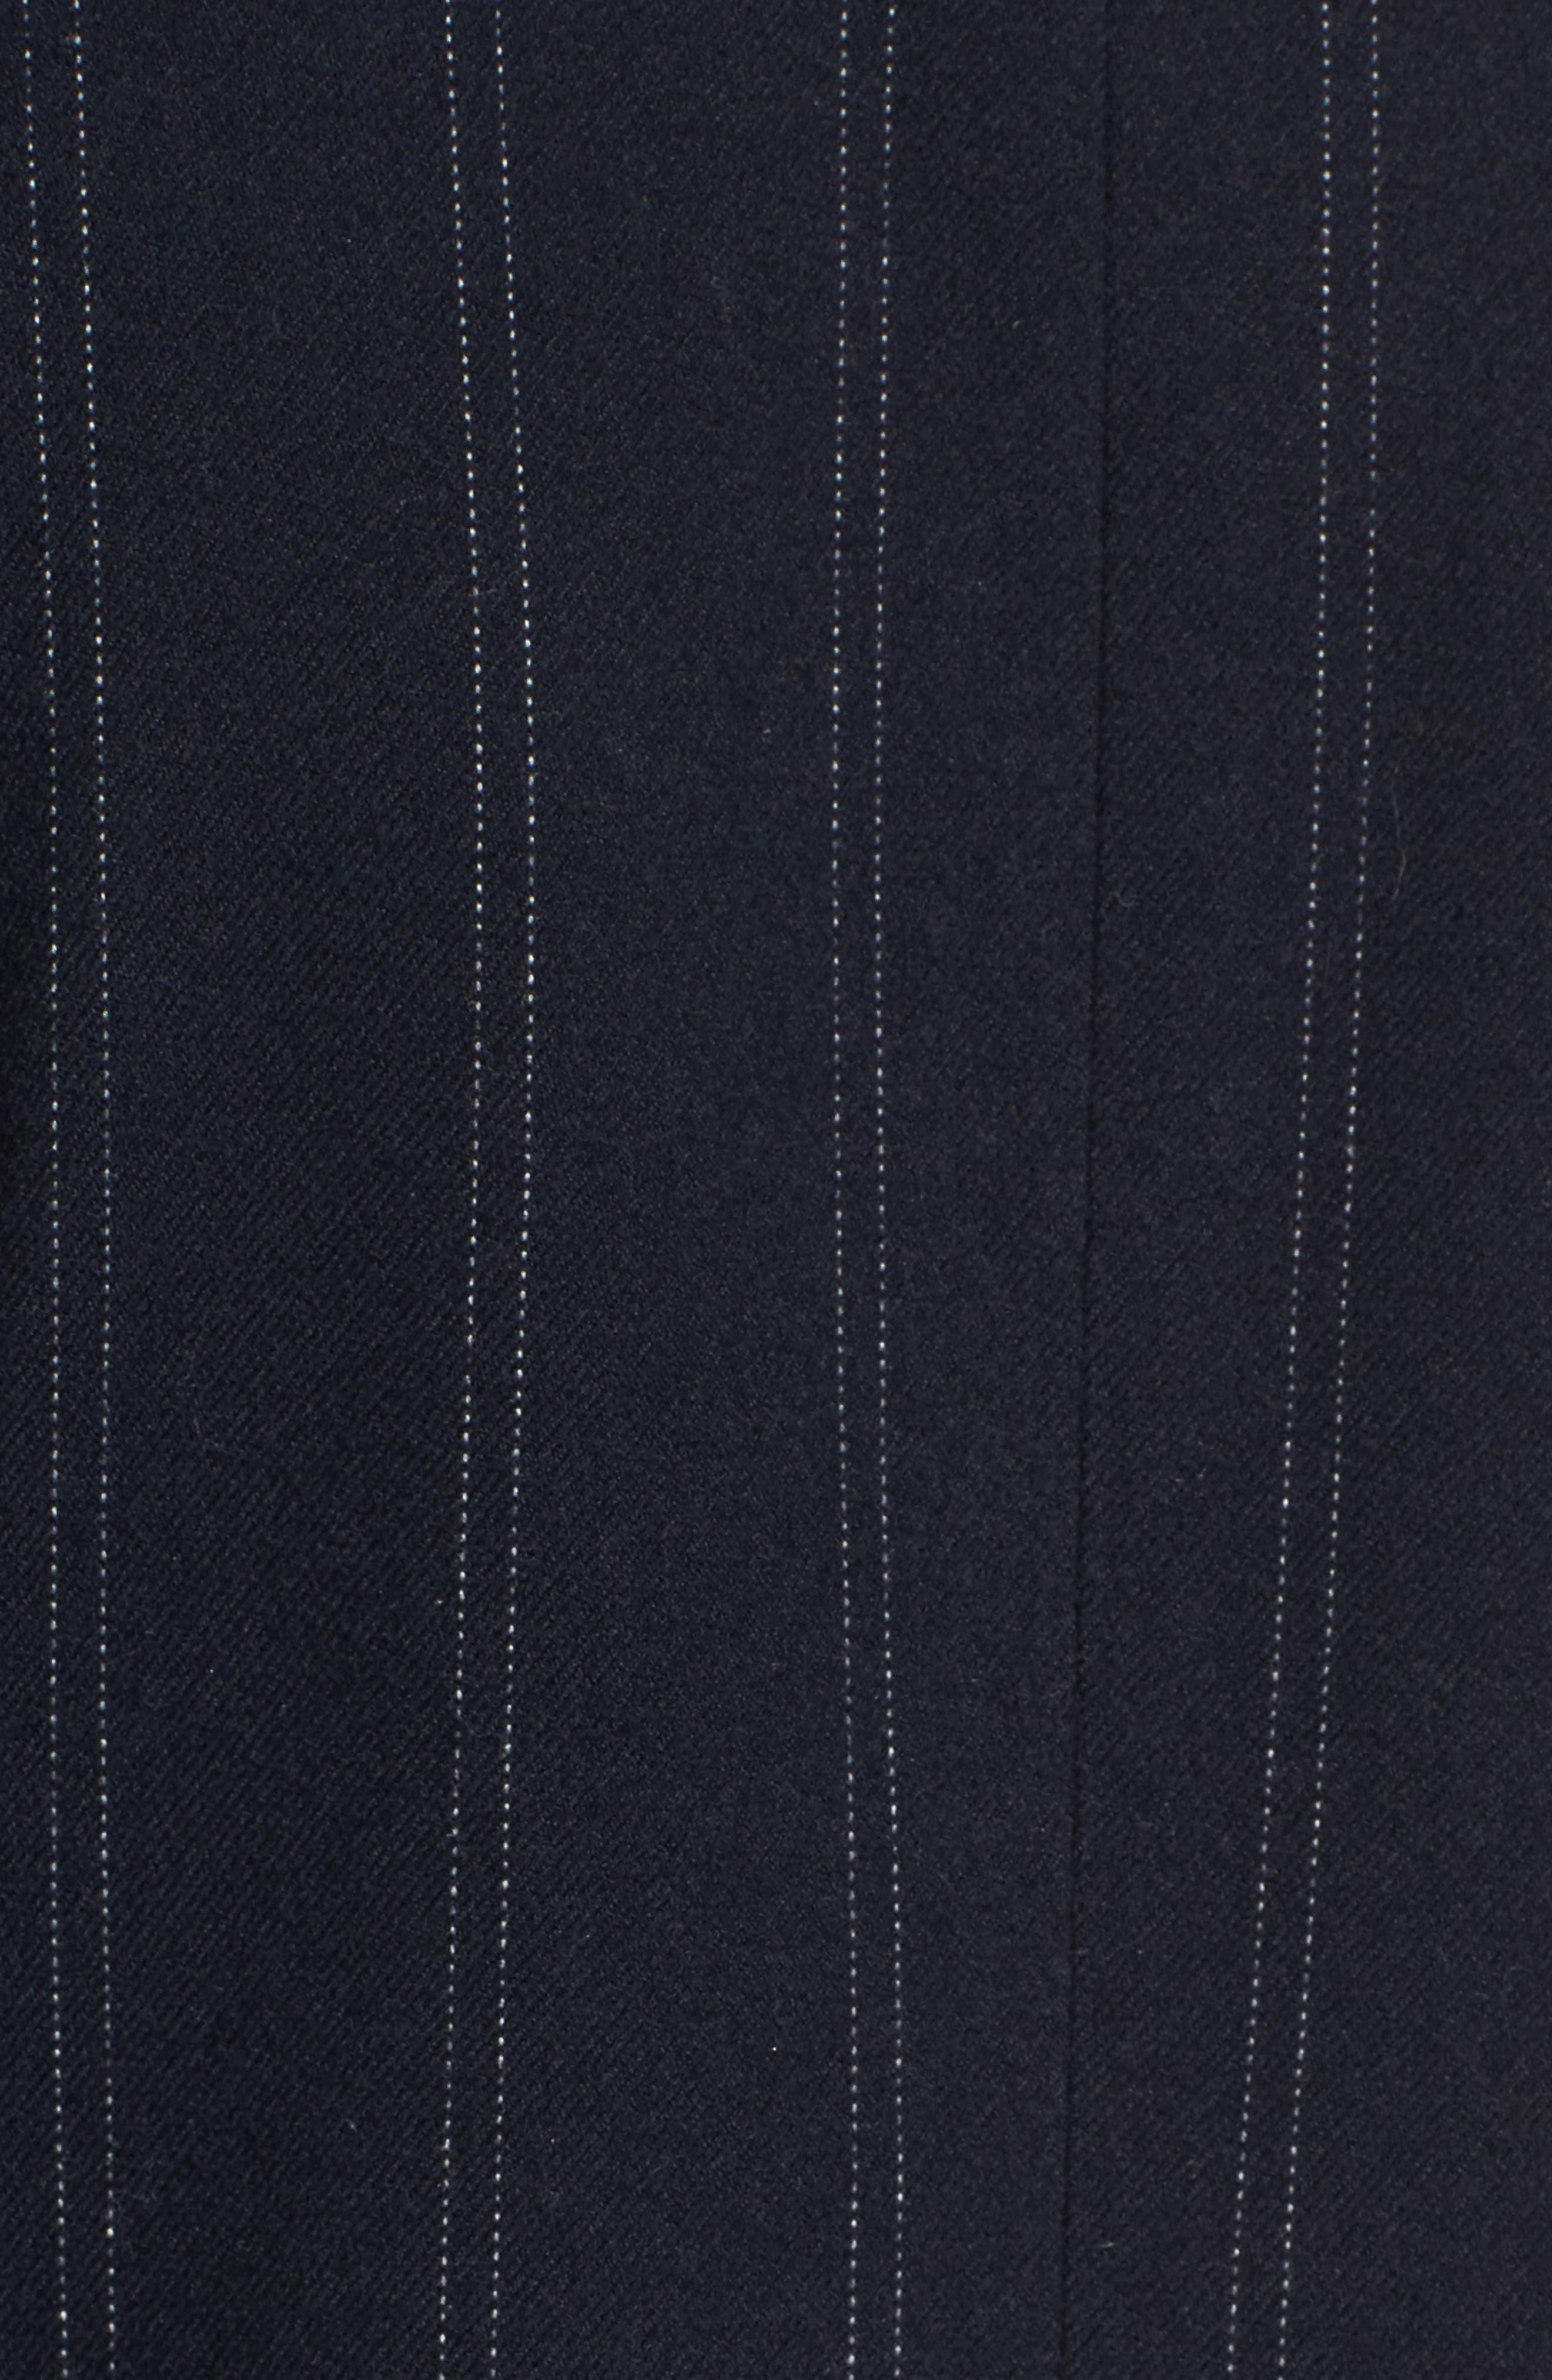 Pinstripe Jacket,                             Alternate thumbnail 5, color,                             Navy Evening Ticking Stripe